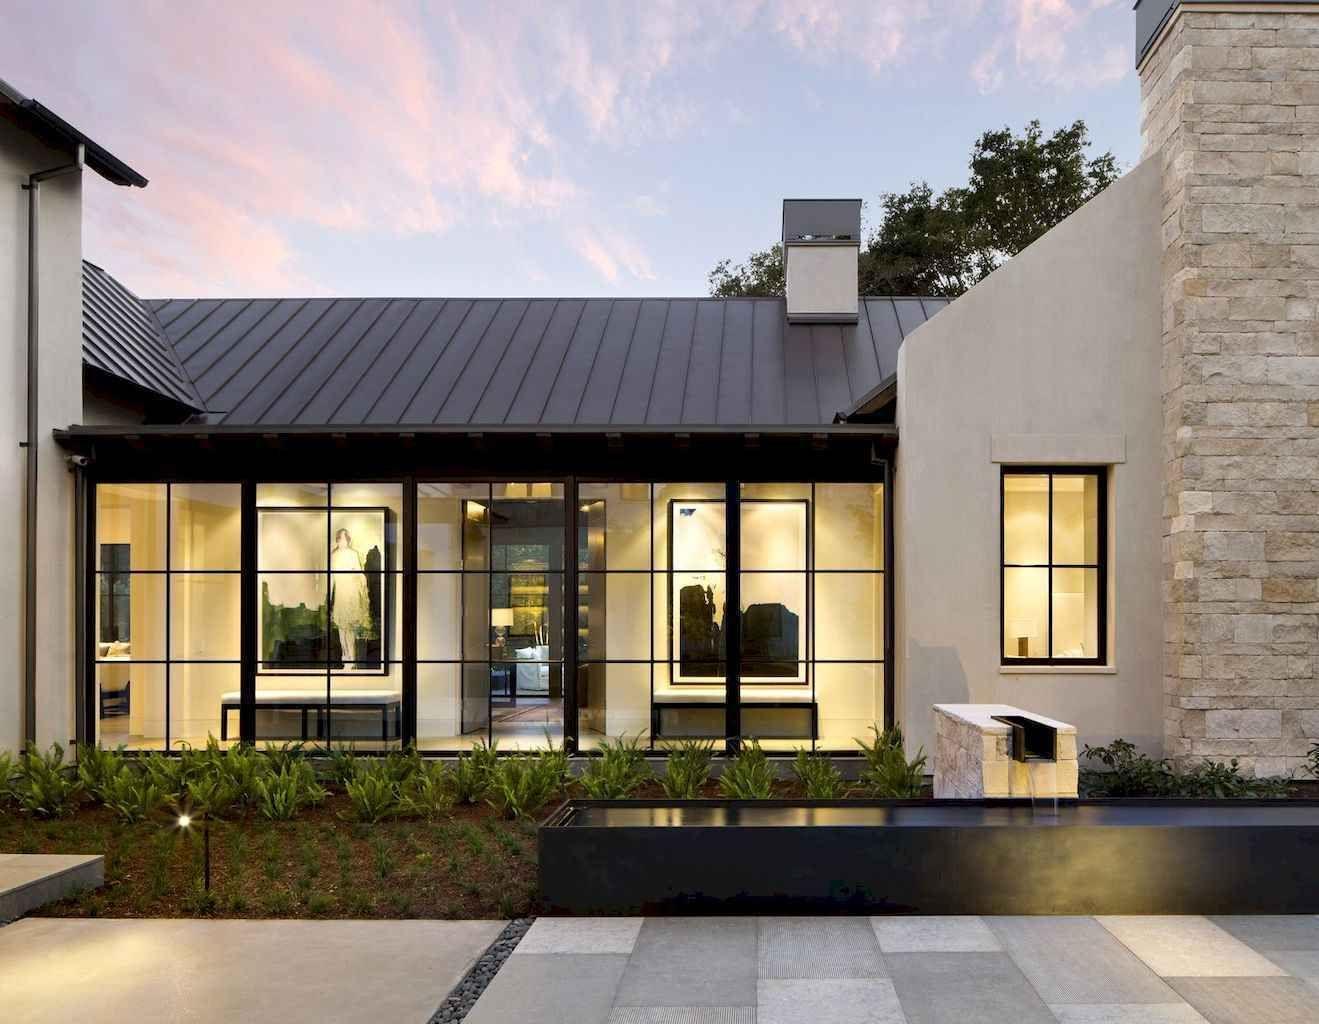 21 rustic farmhouse exterior design ideas in 2020 | Modern ...